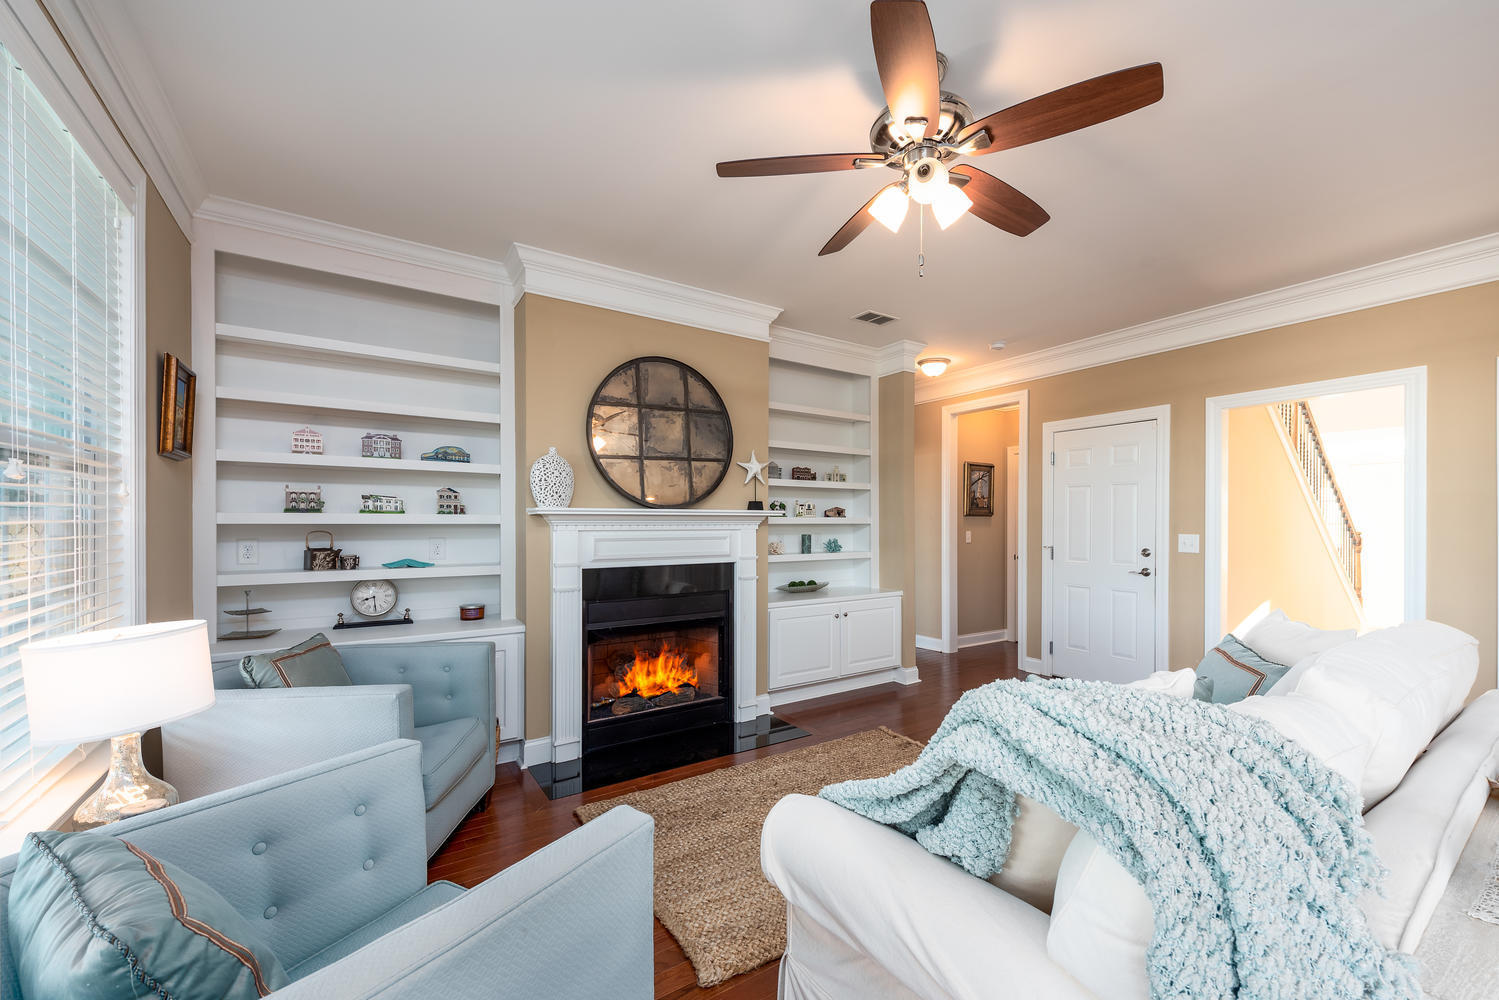 River Reach Pointe Homes For Sale - 1216 Rivers Reach Drive, Charleston, SC - 78